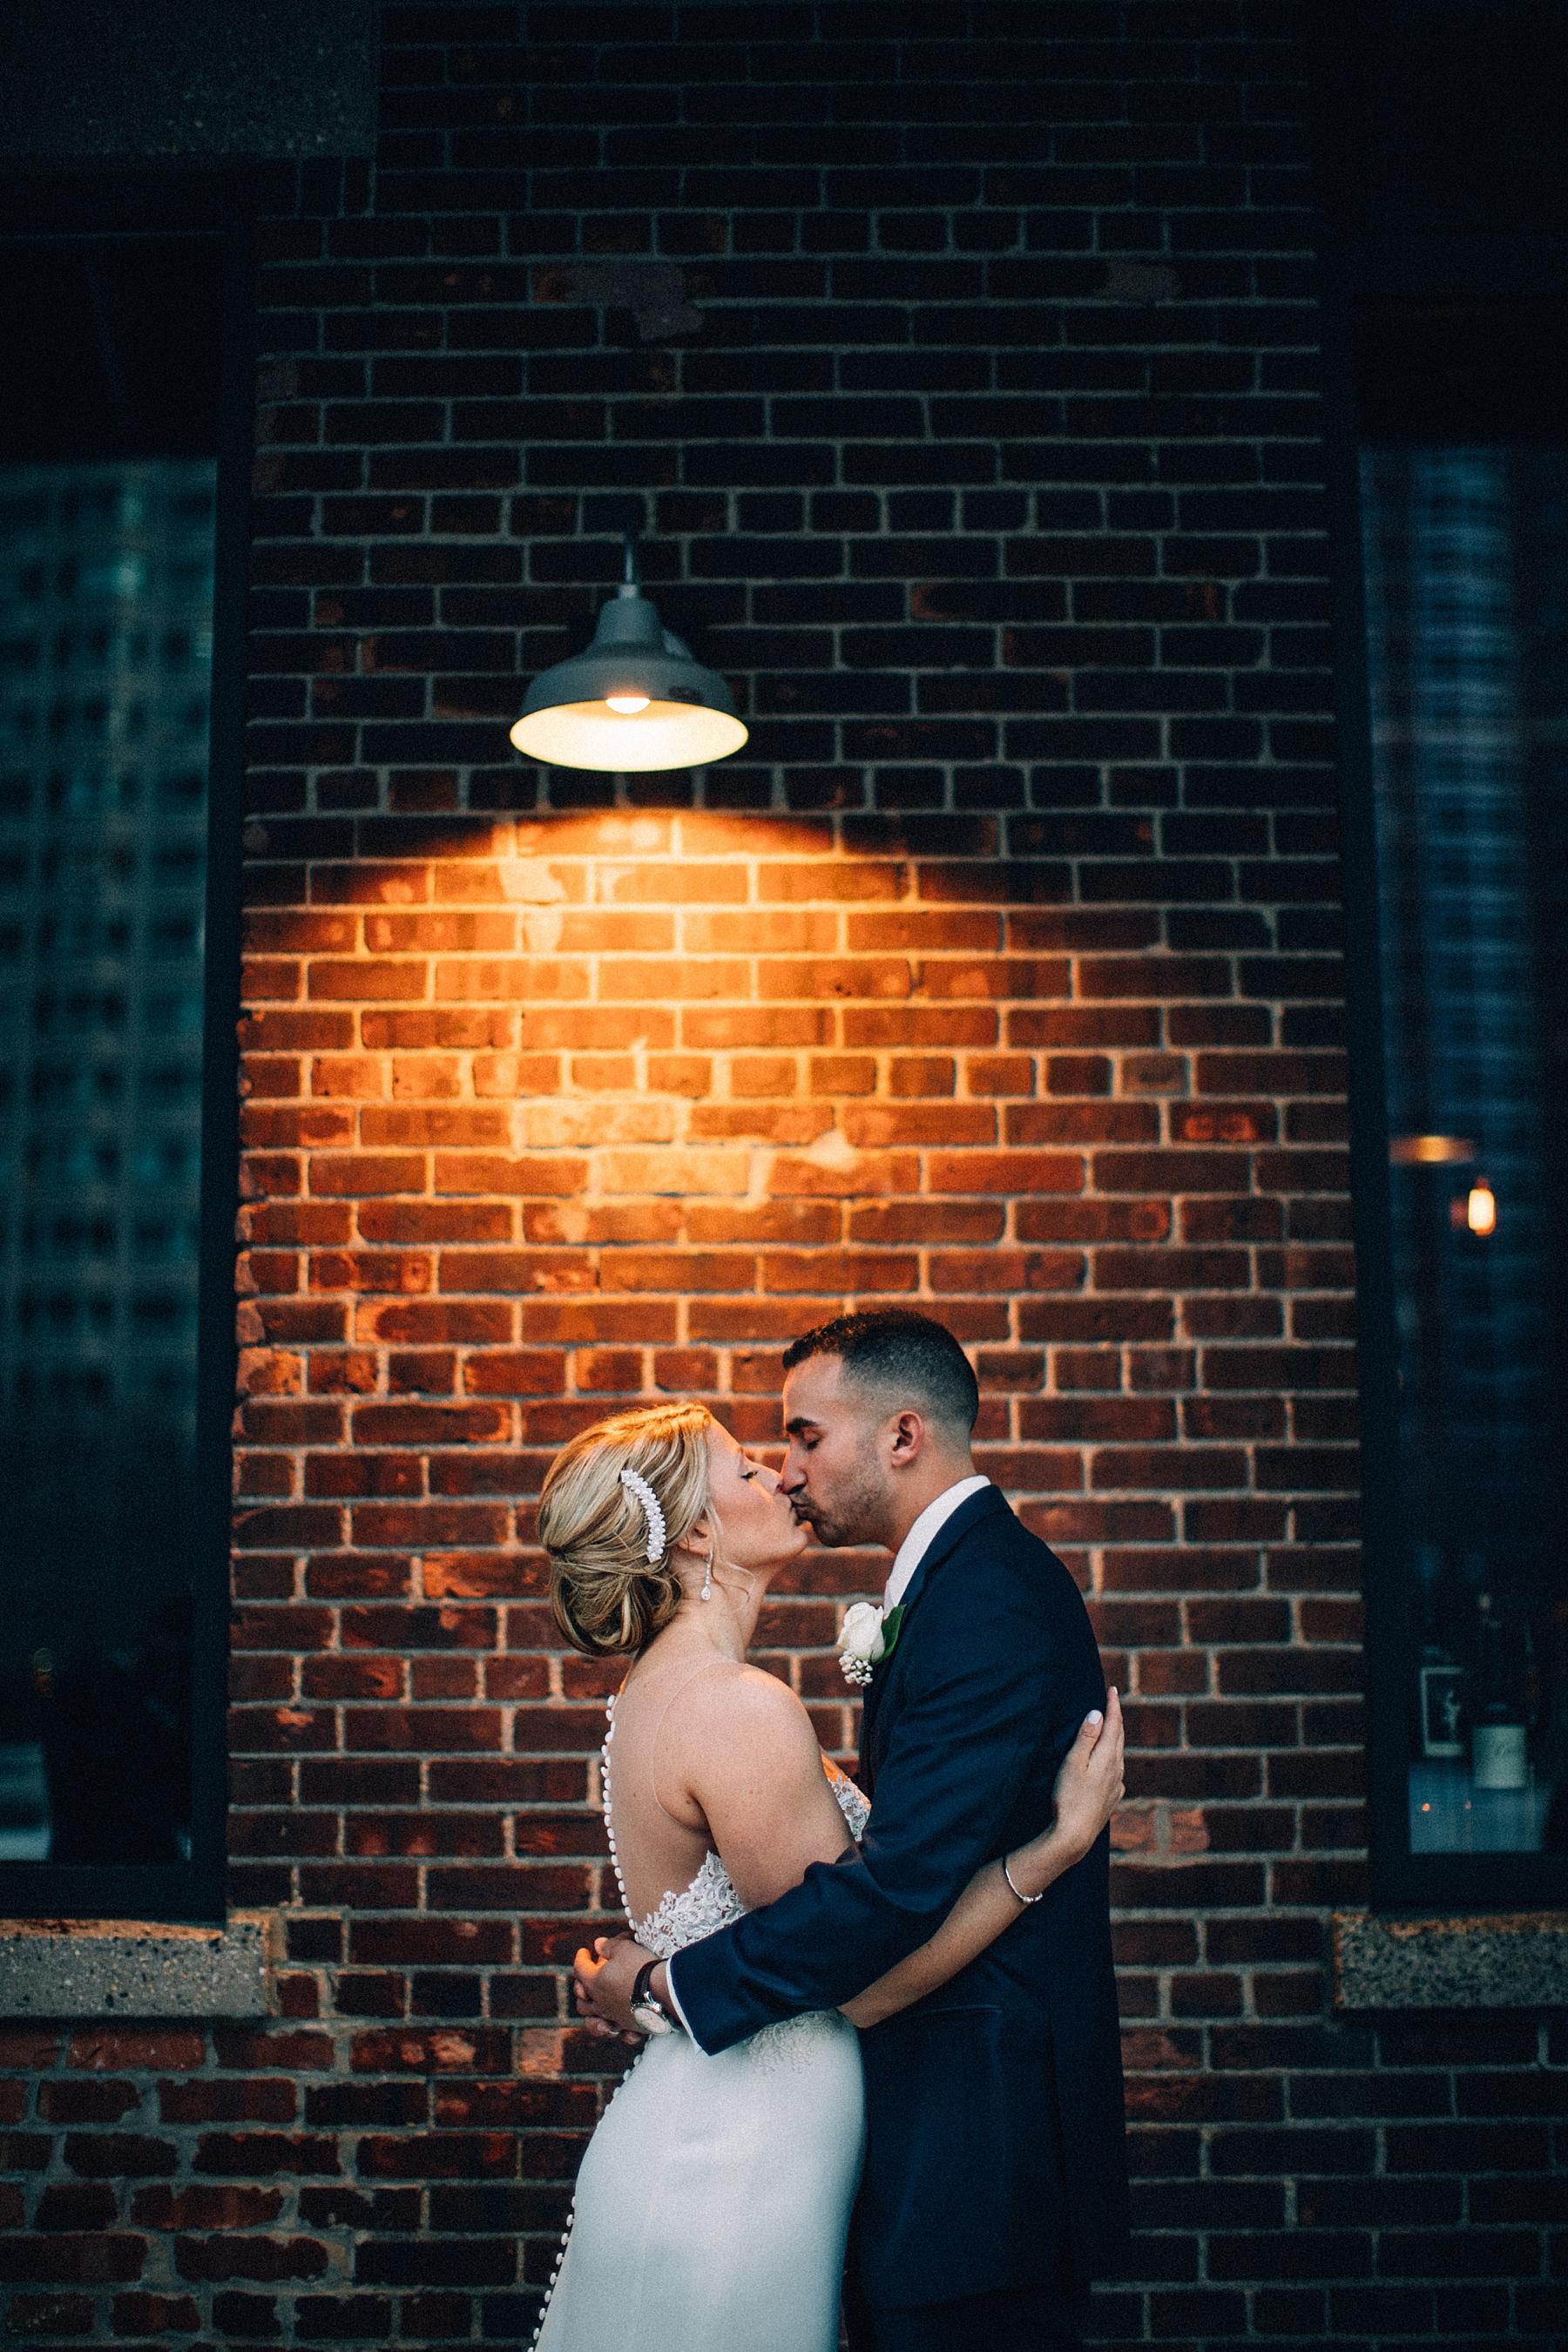 jersey-city-nj-wedding-photographer-top_0037.jpg